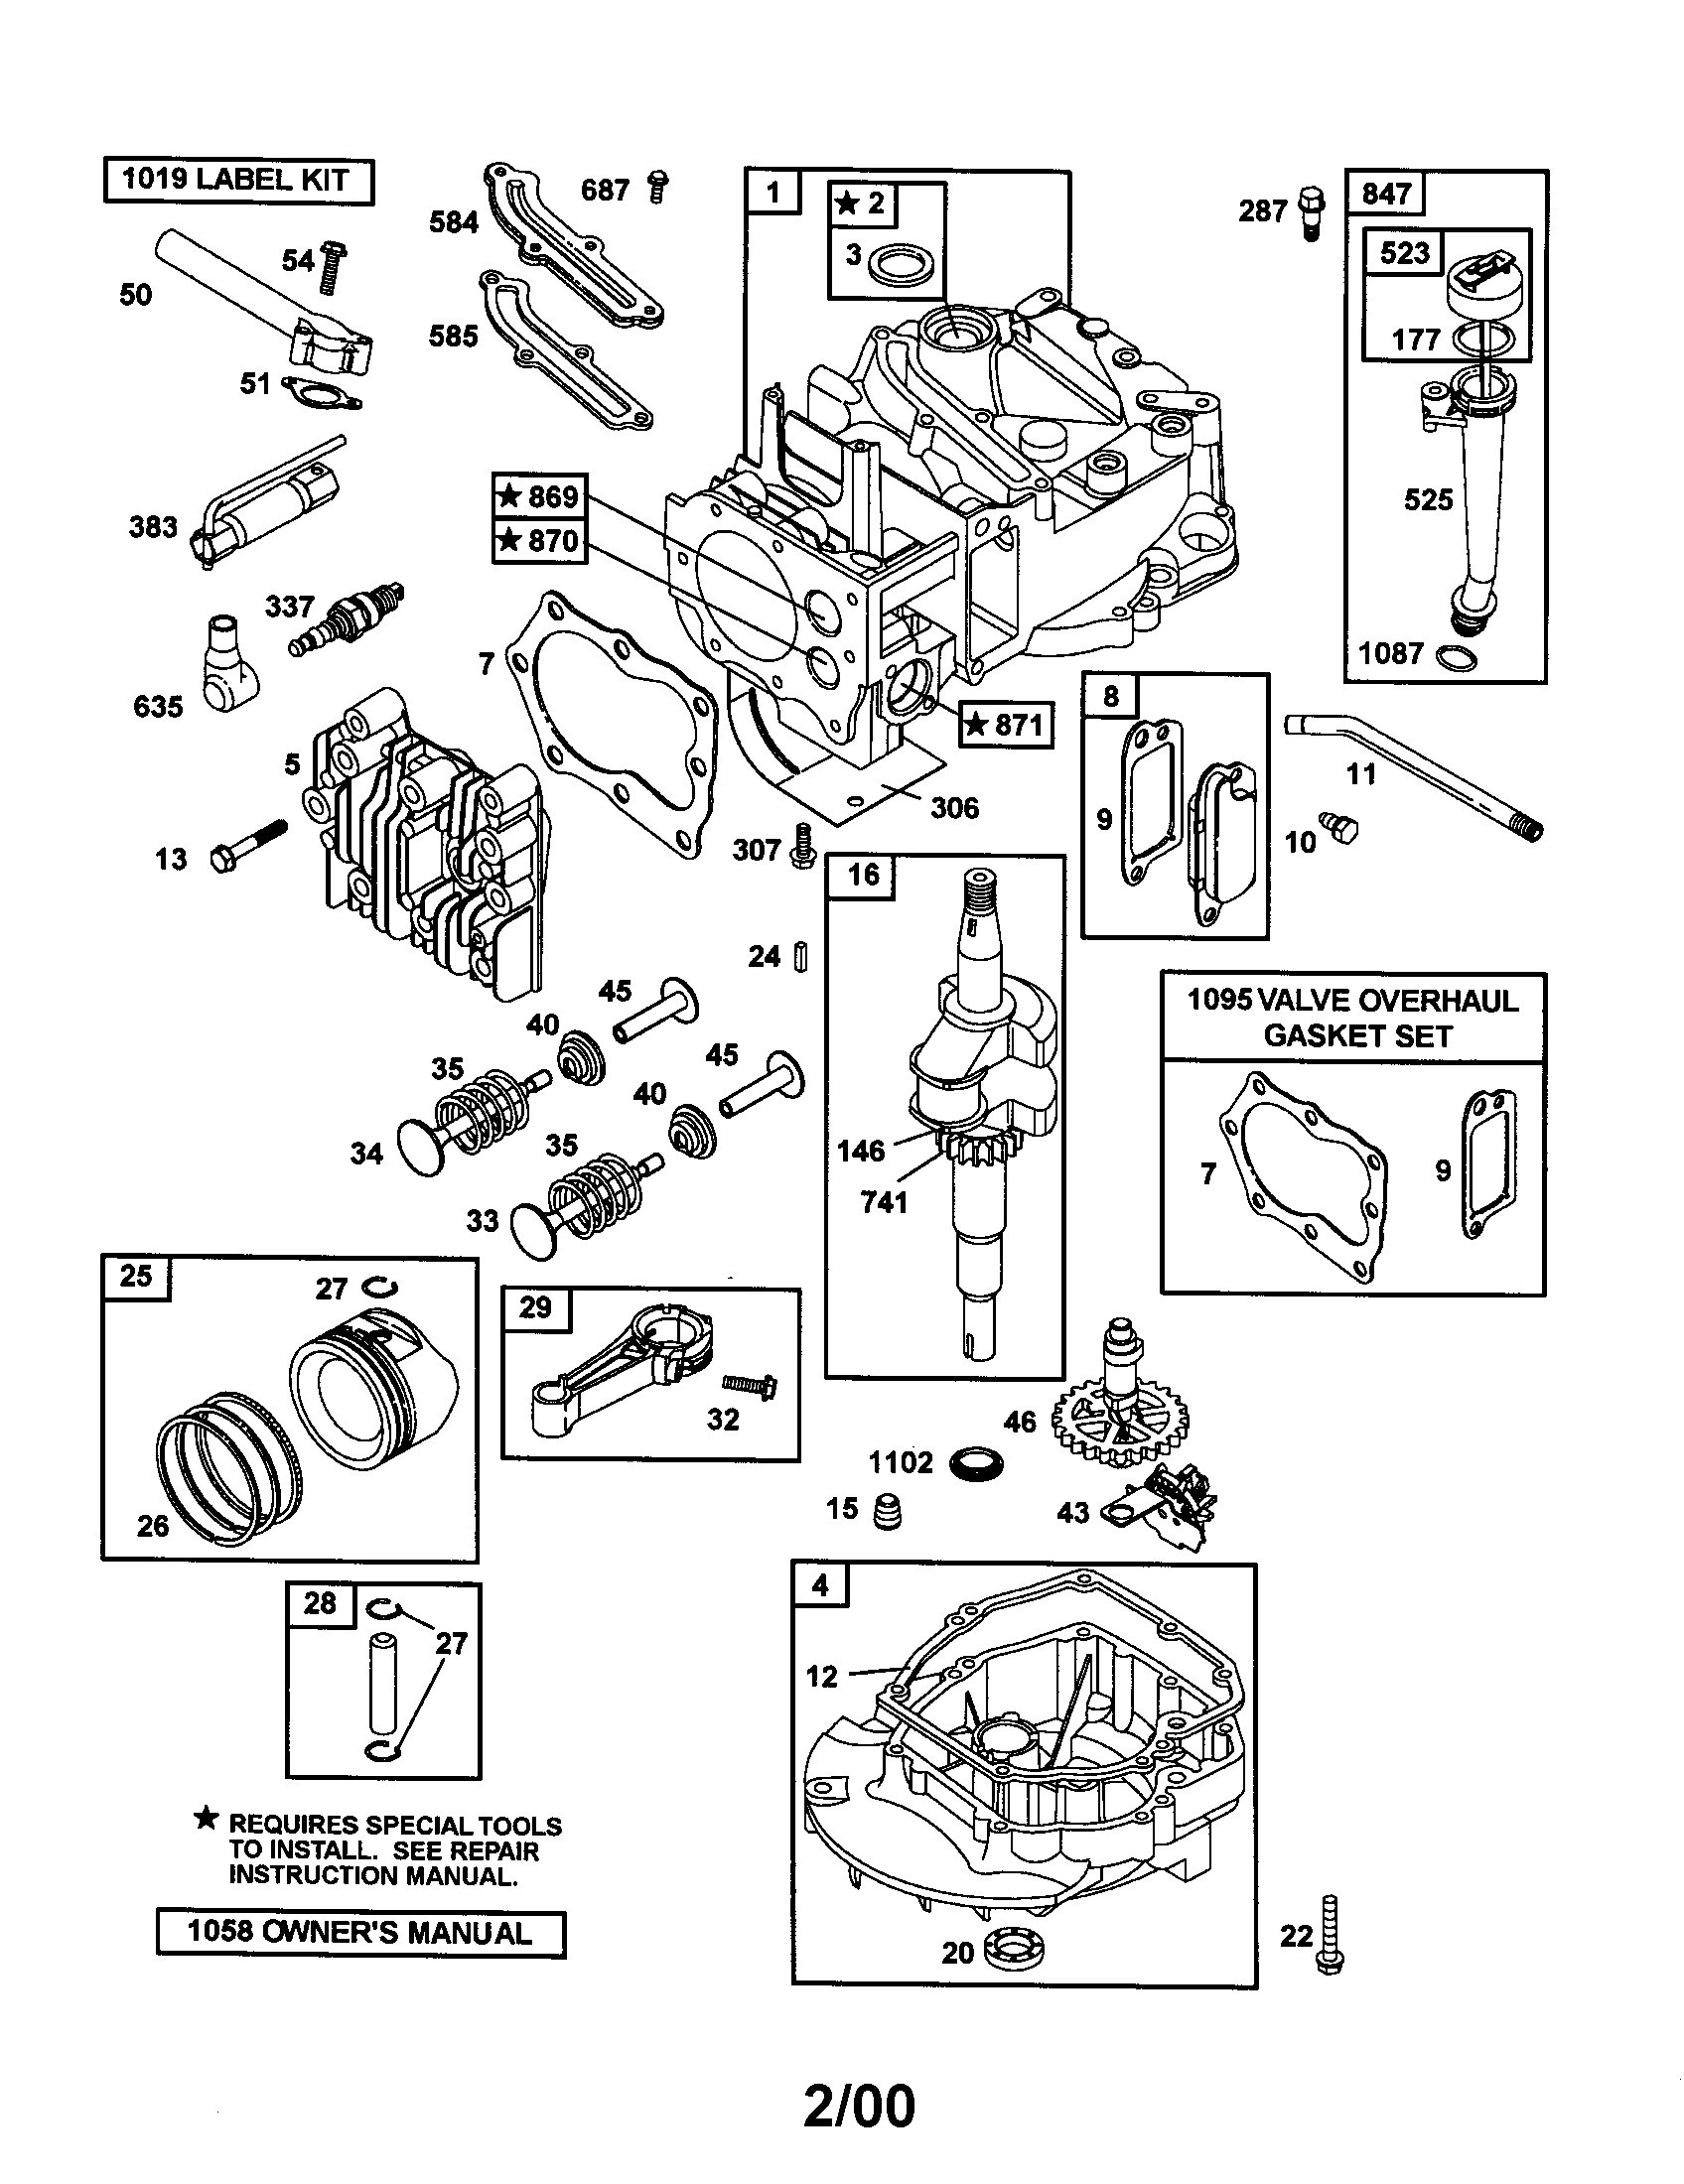 1980 Cushman Titan 36 Volt Battery Wiring Diagram